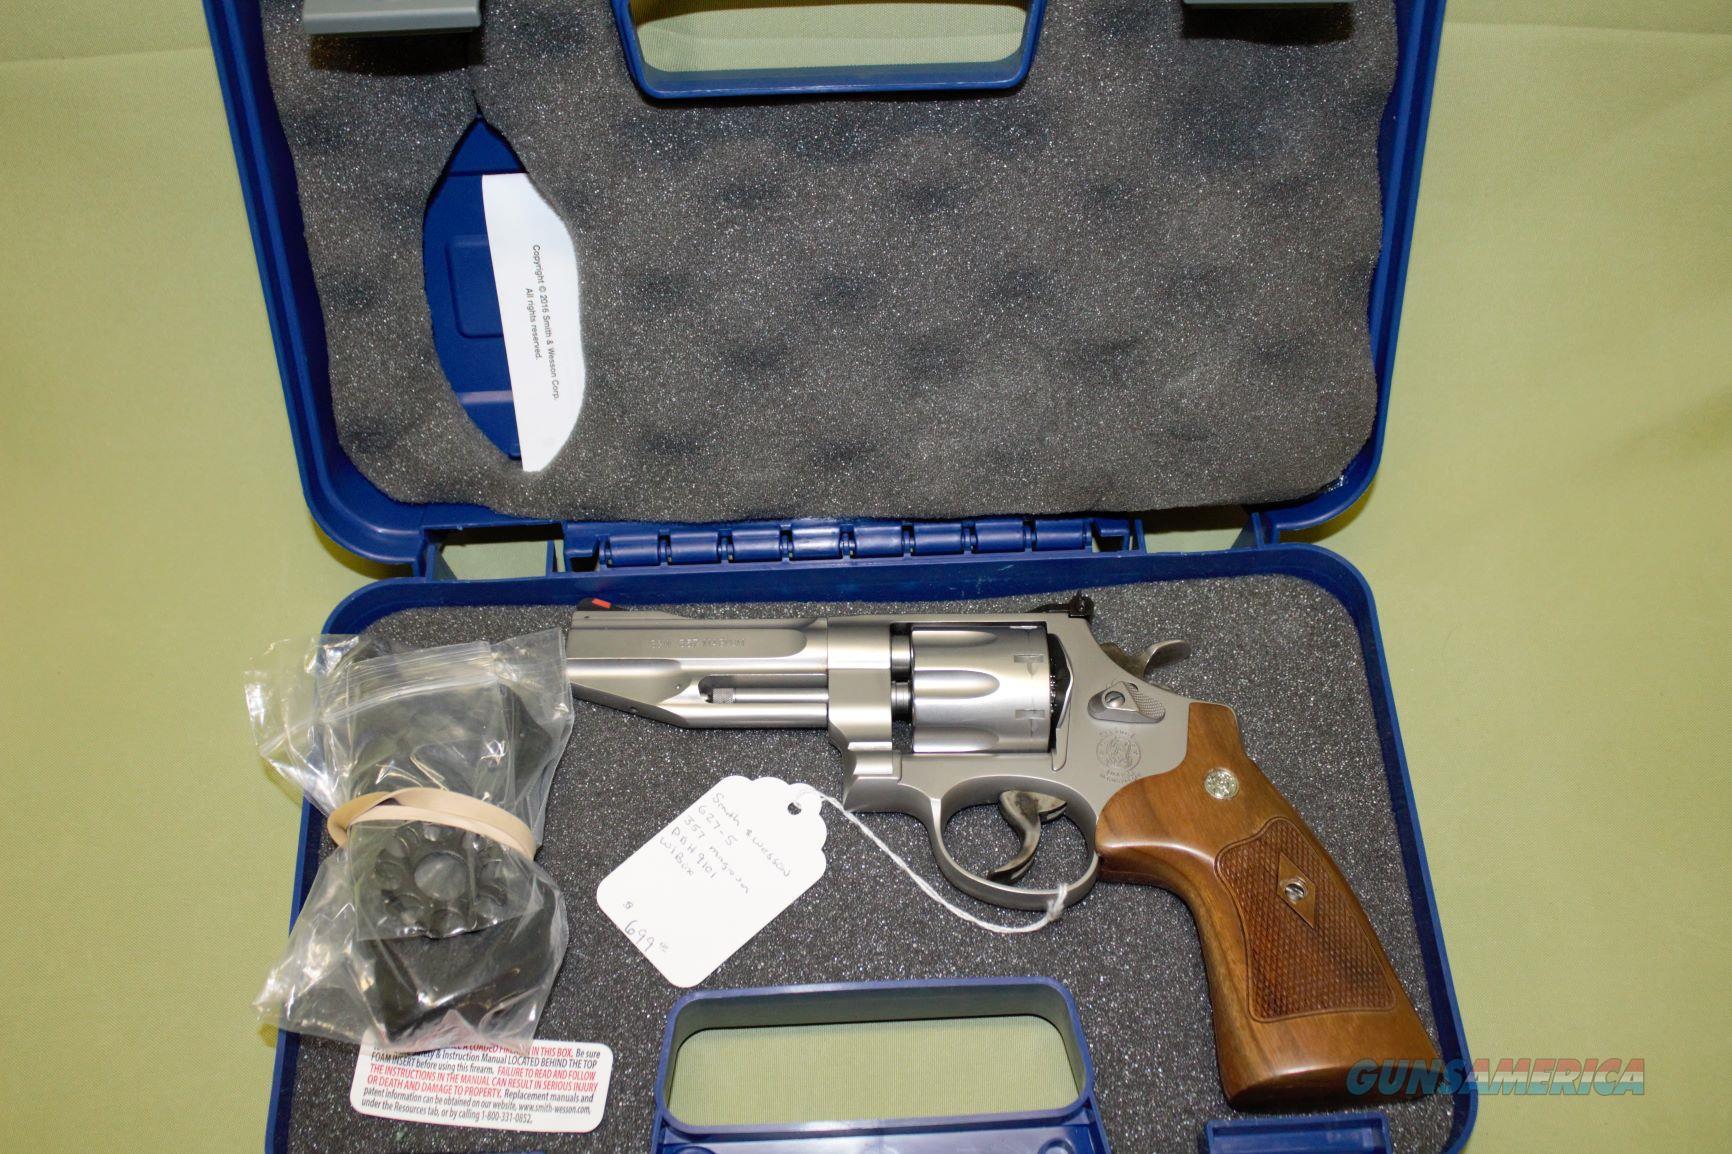 Smith&Wesson Pro Series 627-5 357 Magnum  Guns > Pistols > Smith & Wesson Revolvers > Full Frame Revolver